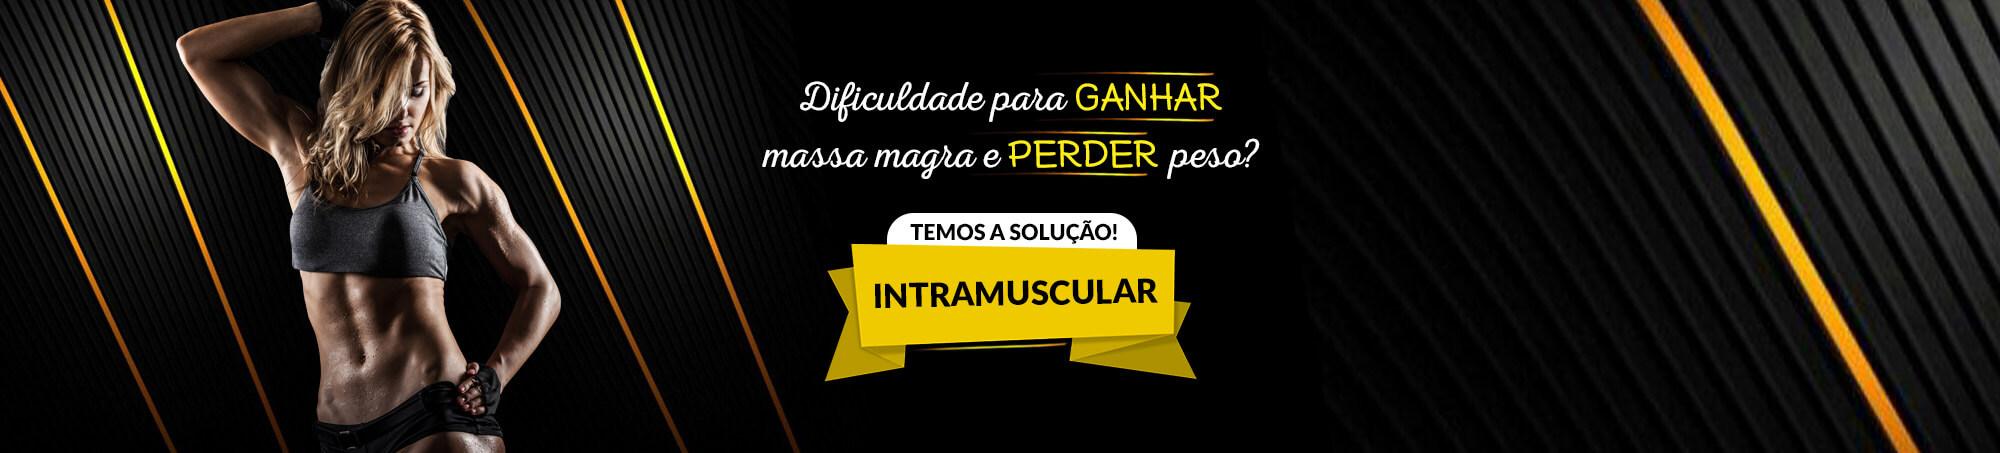 banner-fisest-2000x453-Intramuscular-Correto-Comprimido